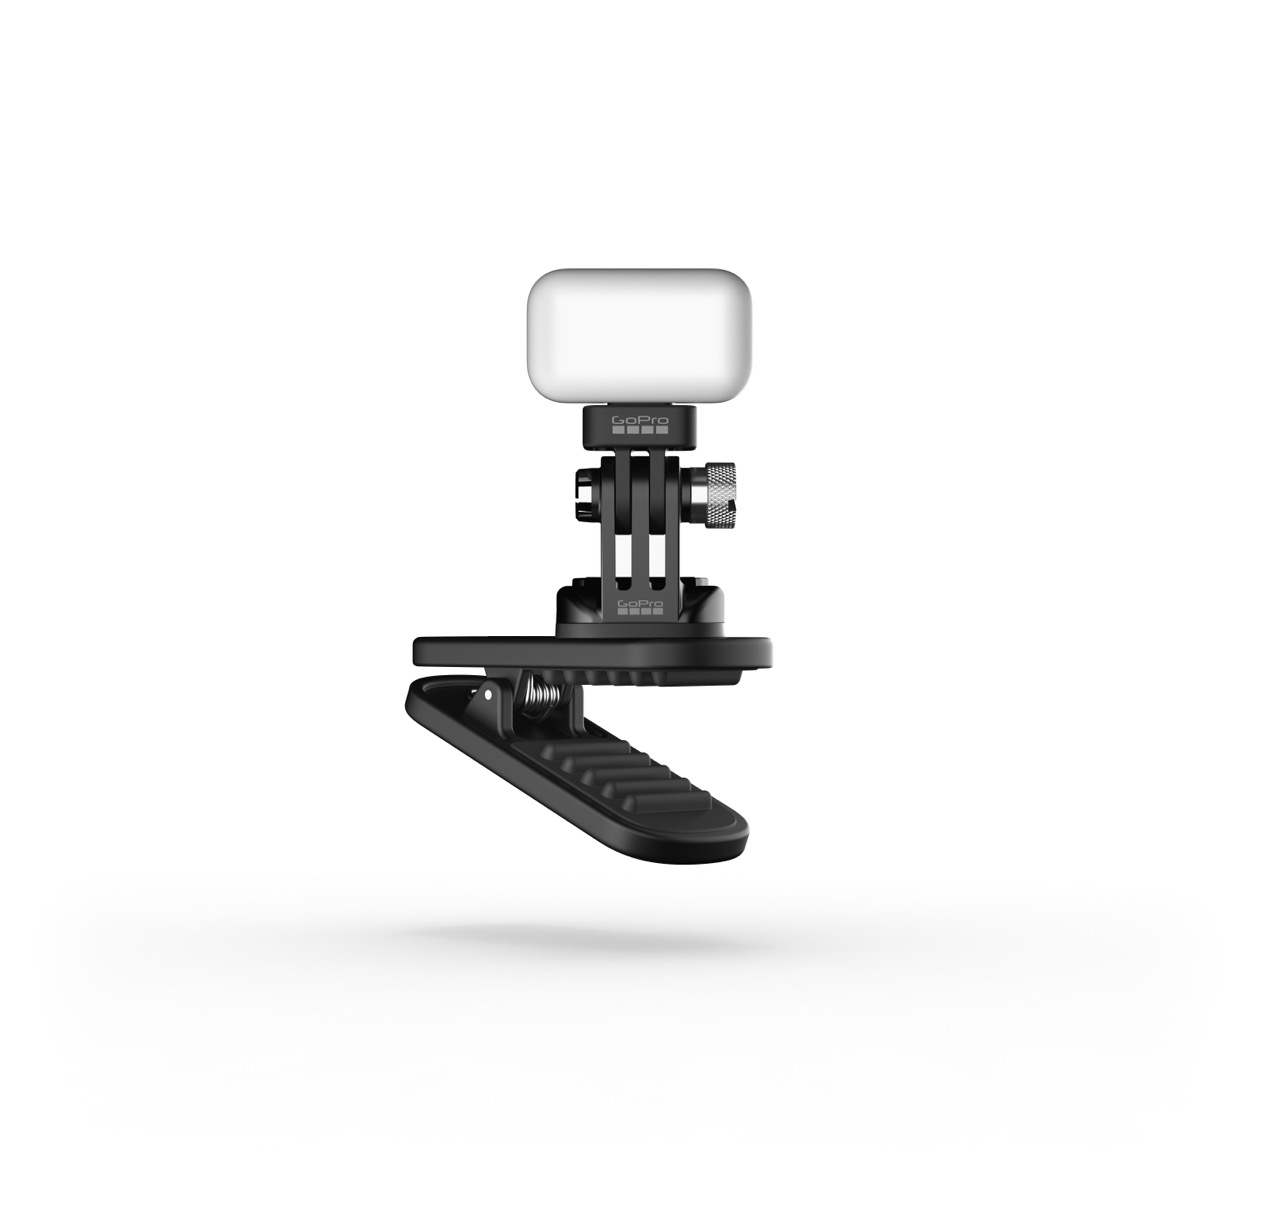 GoPro、マグネット内蔵で様々な用途で使用可能なライト「Zeus Mini」発売開始